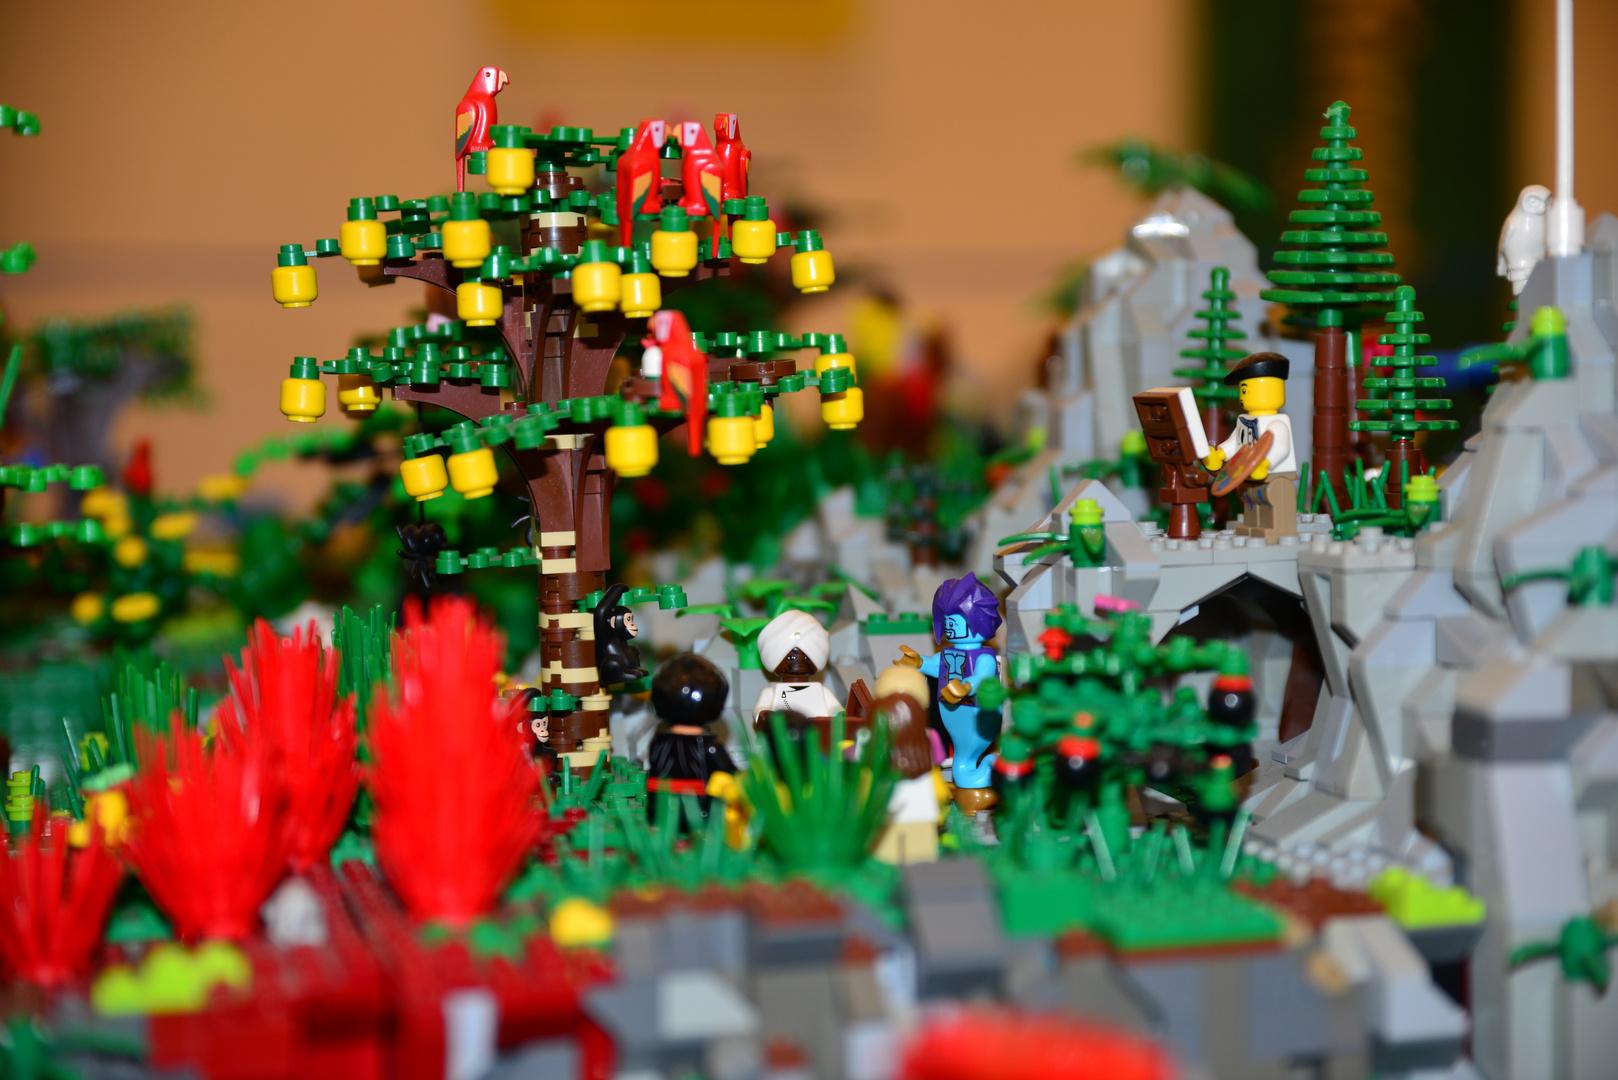 Legoausstellung Bruchsal